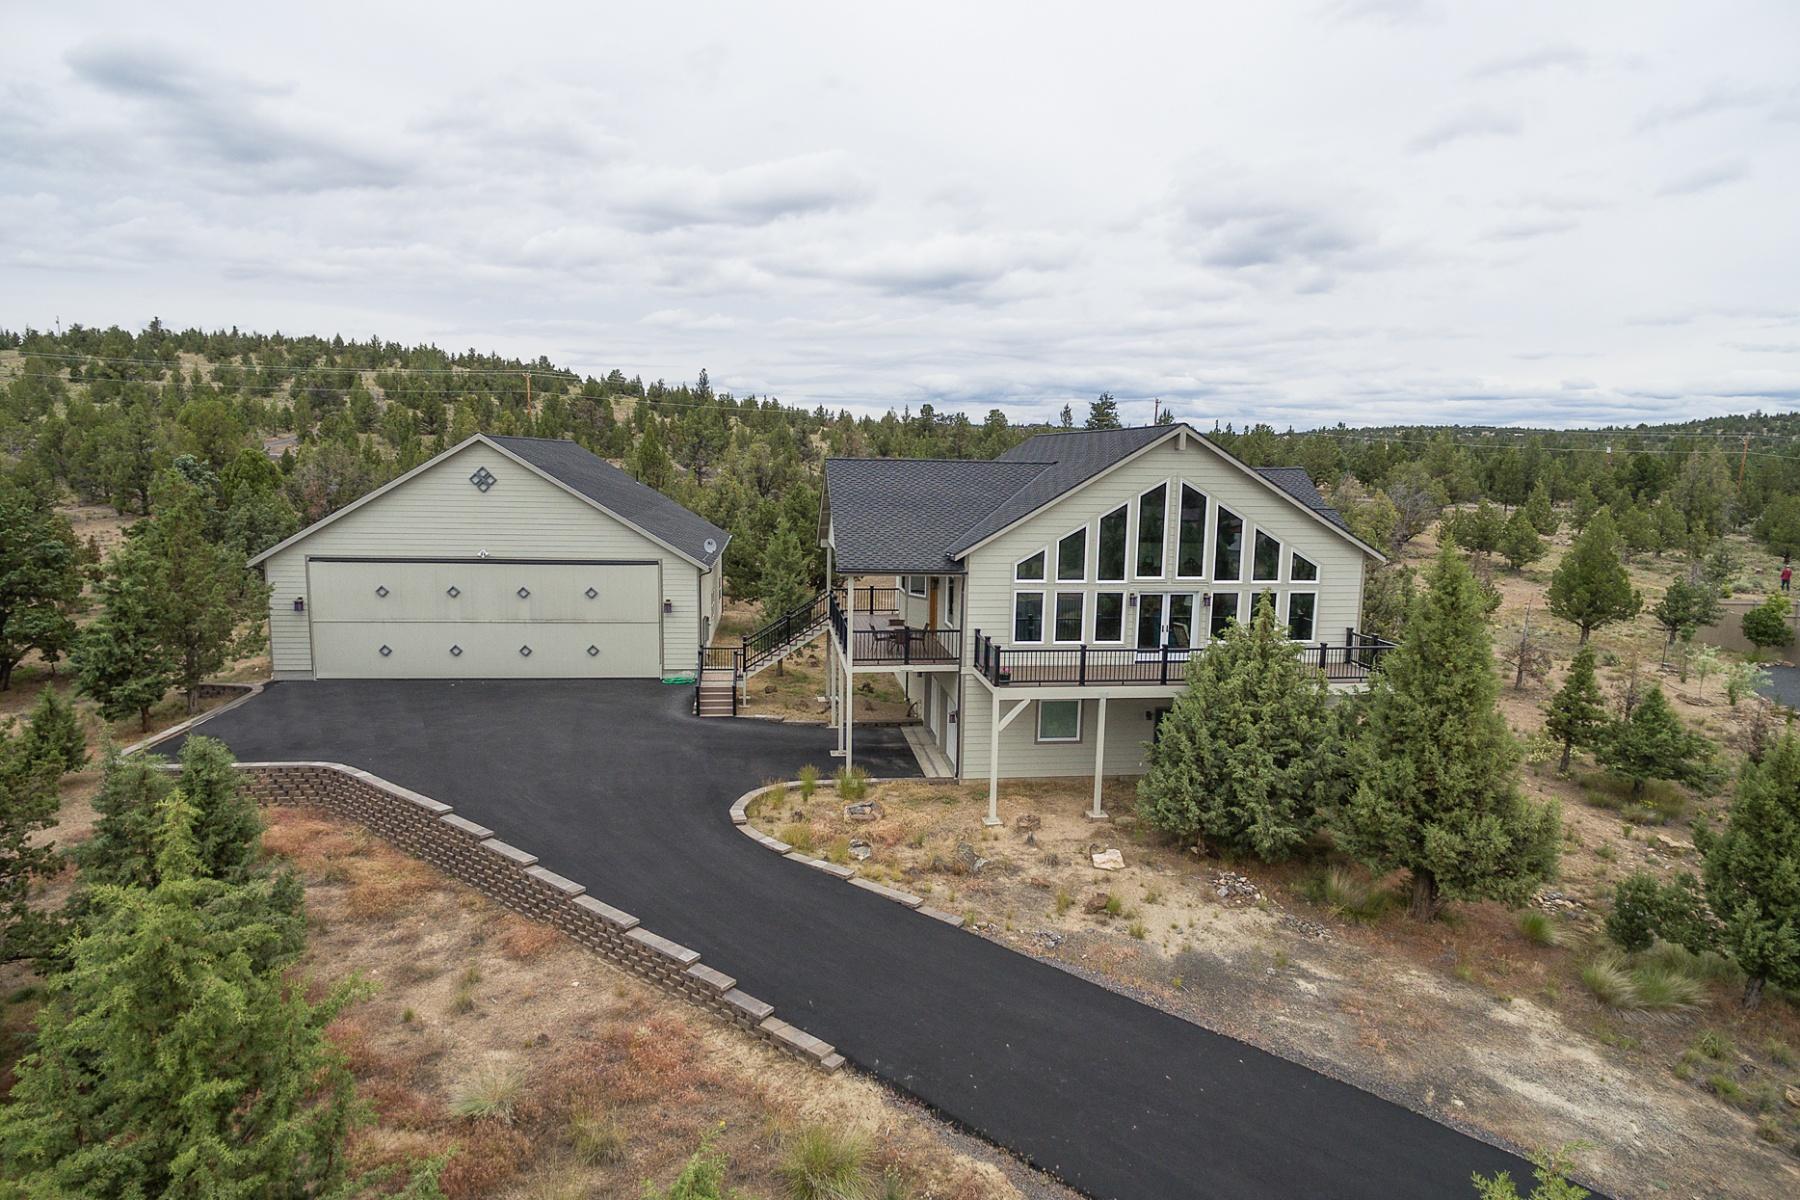 Villa per Vendita alle ore 2321 SE Landings Way, PRINEVILLE Prineville, Oregon, 97754 Stati Uniti